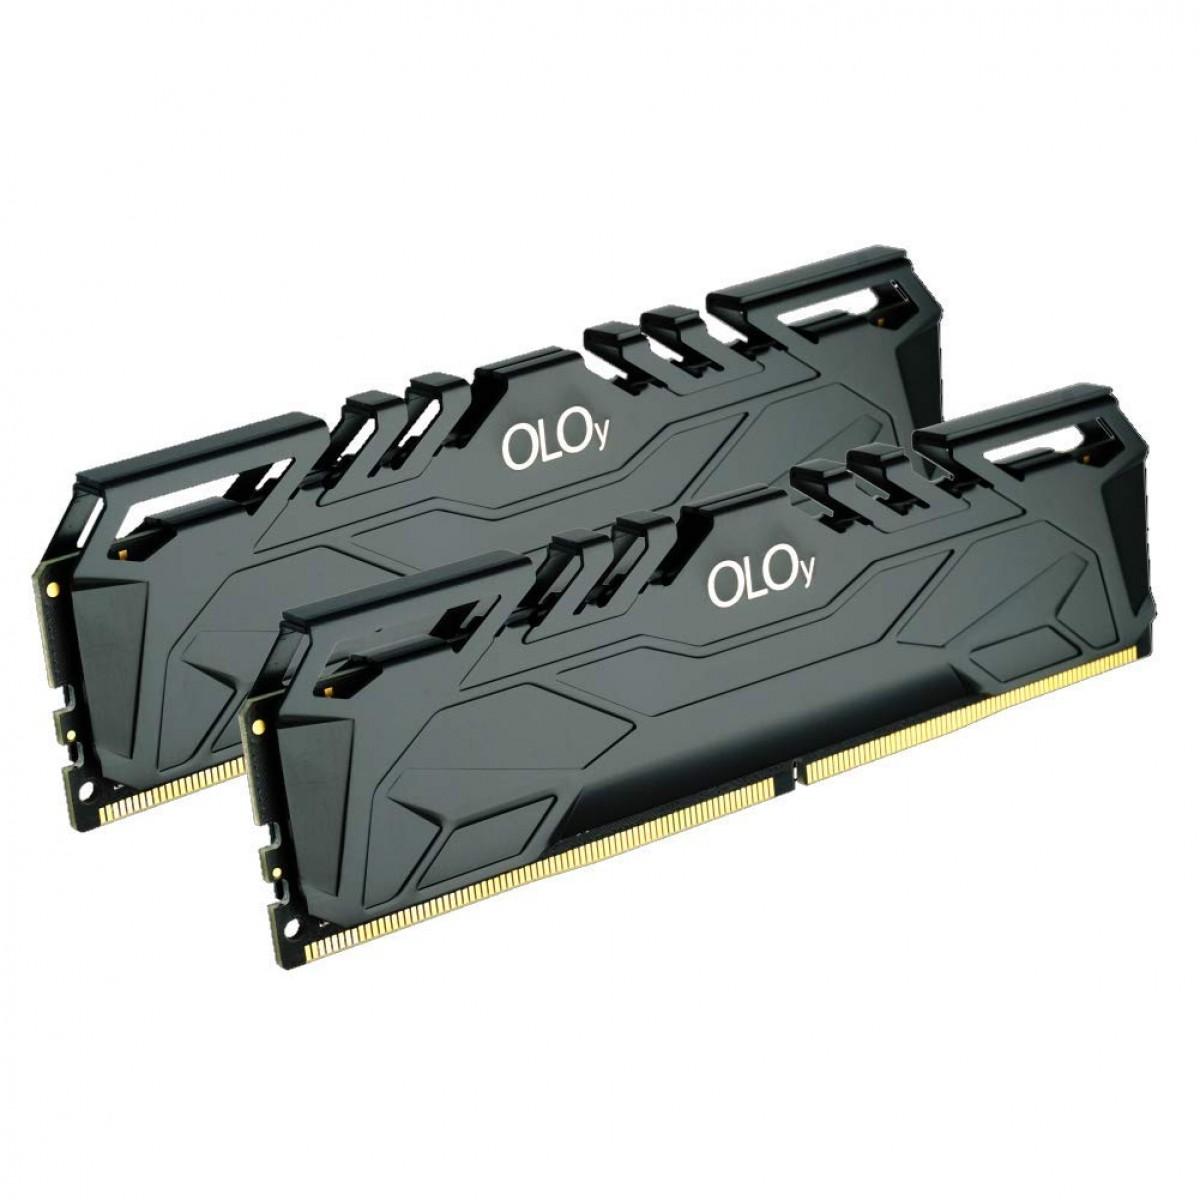 Memória DDR4 OLOy Owl Black, 32GB (2x16GB), 2666MHz, Black, MD4U162619BJDA - IMP